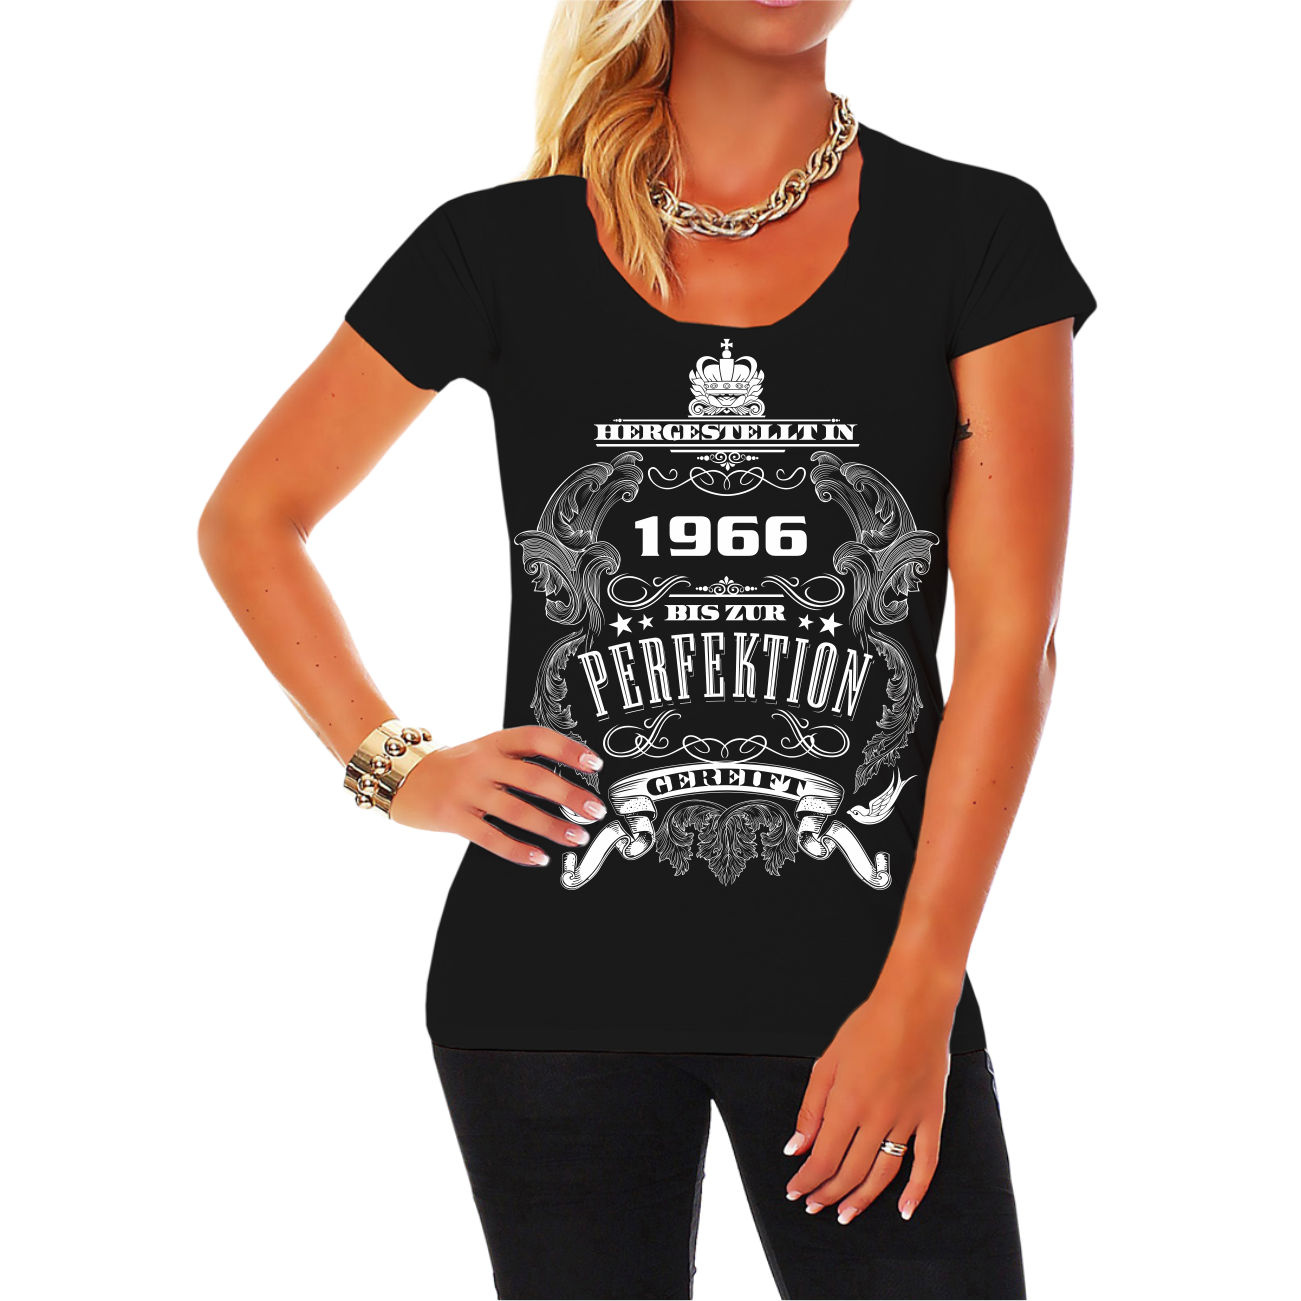 frauen t-shirt bis zur perfektion gereift 1966 geschenk 50